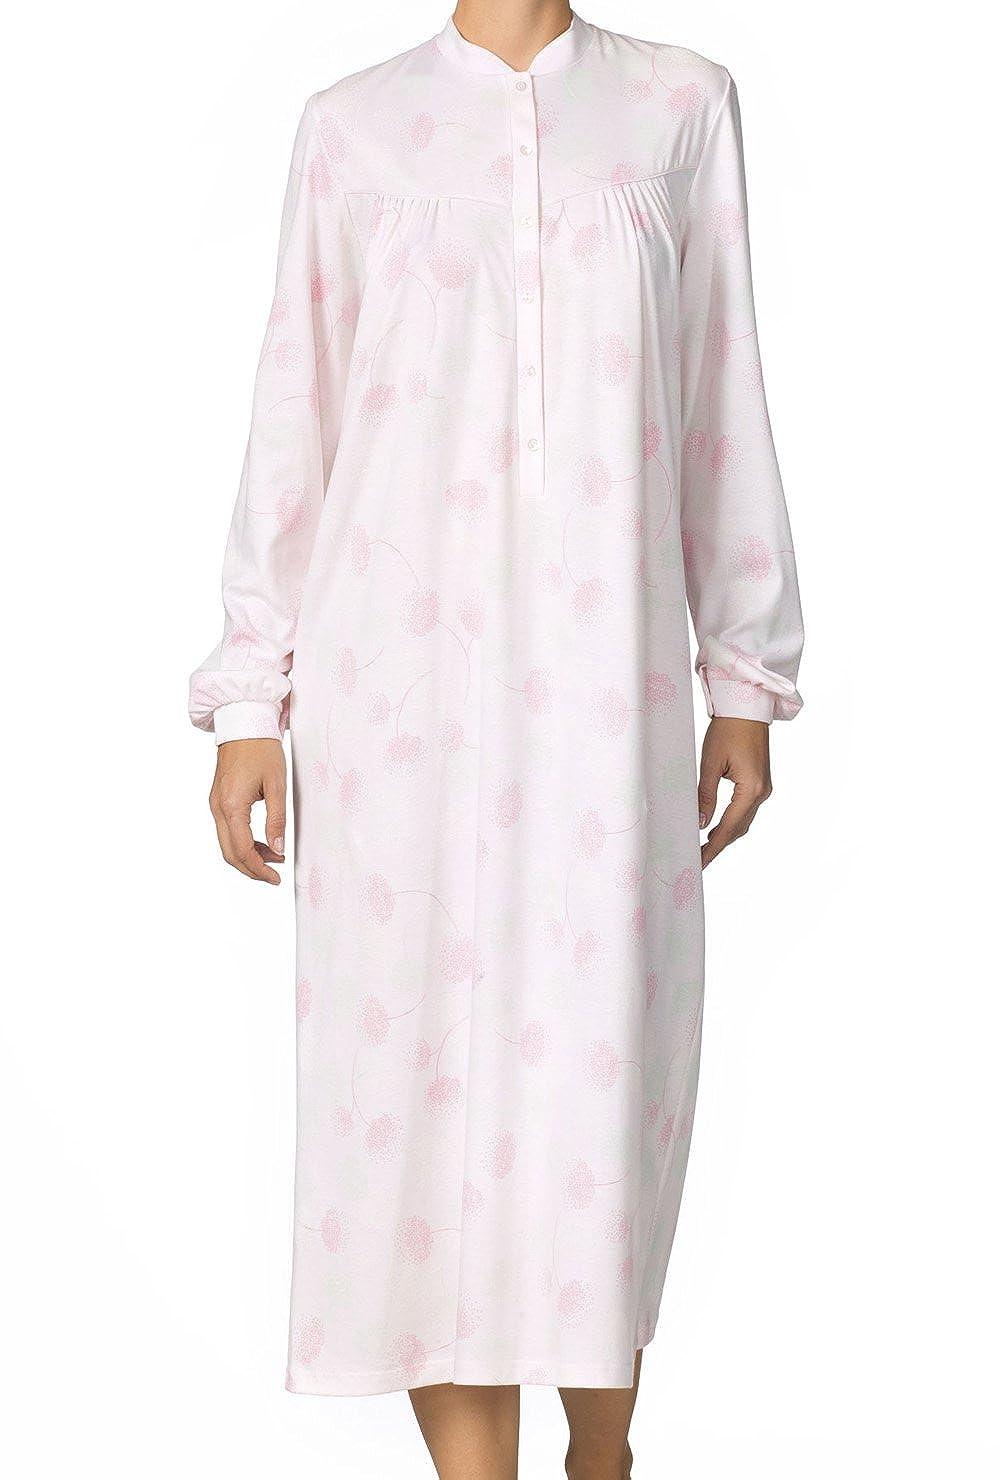 Calida - Camicia da notte, Donna Calida AG 33800